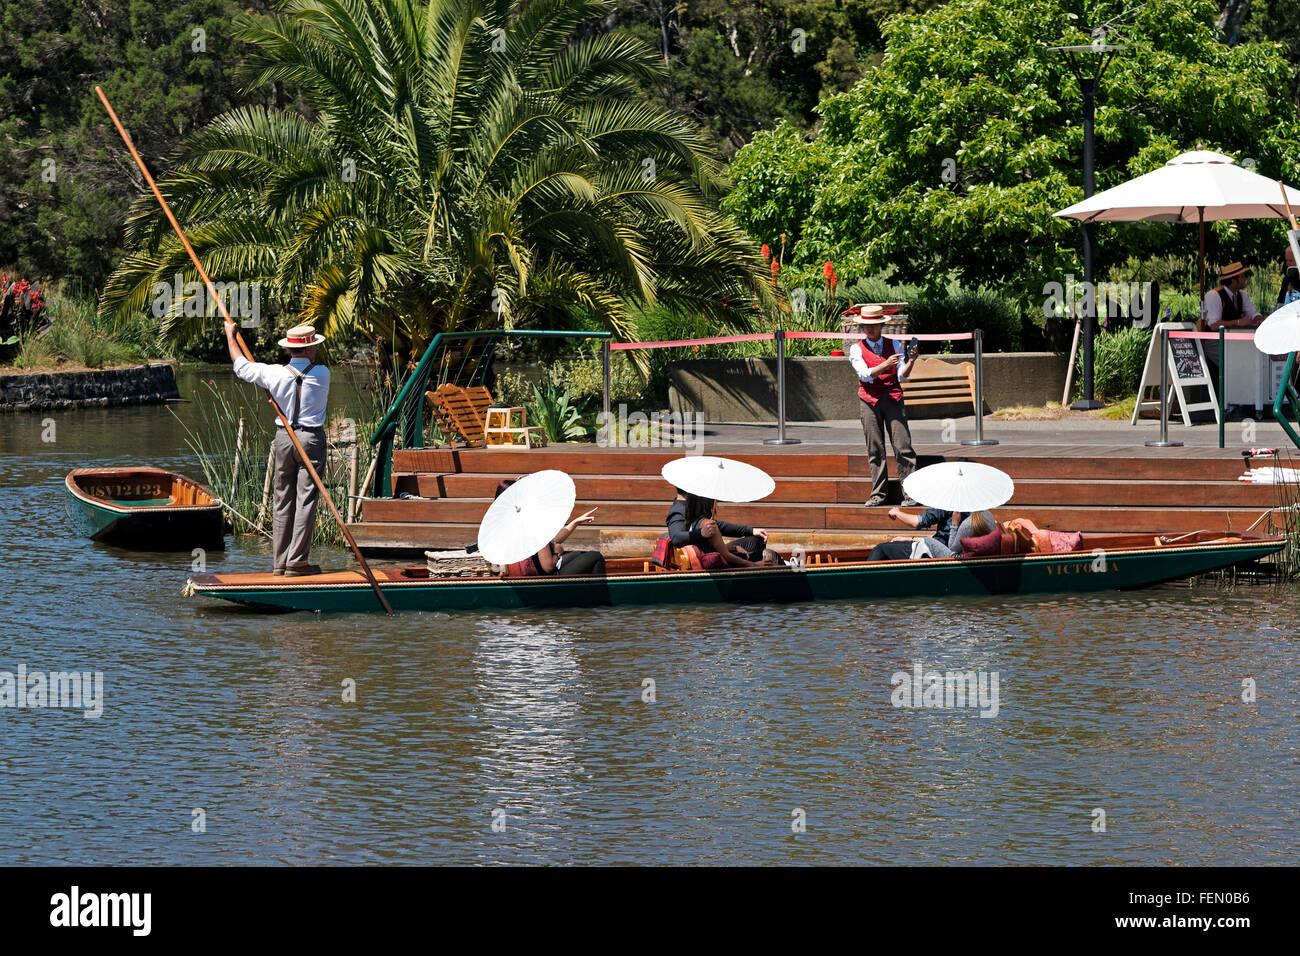 Punt Tour, The Royal Botanic Gardens, Melbourne, Australia